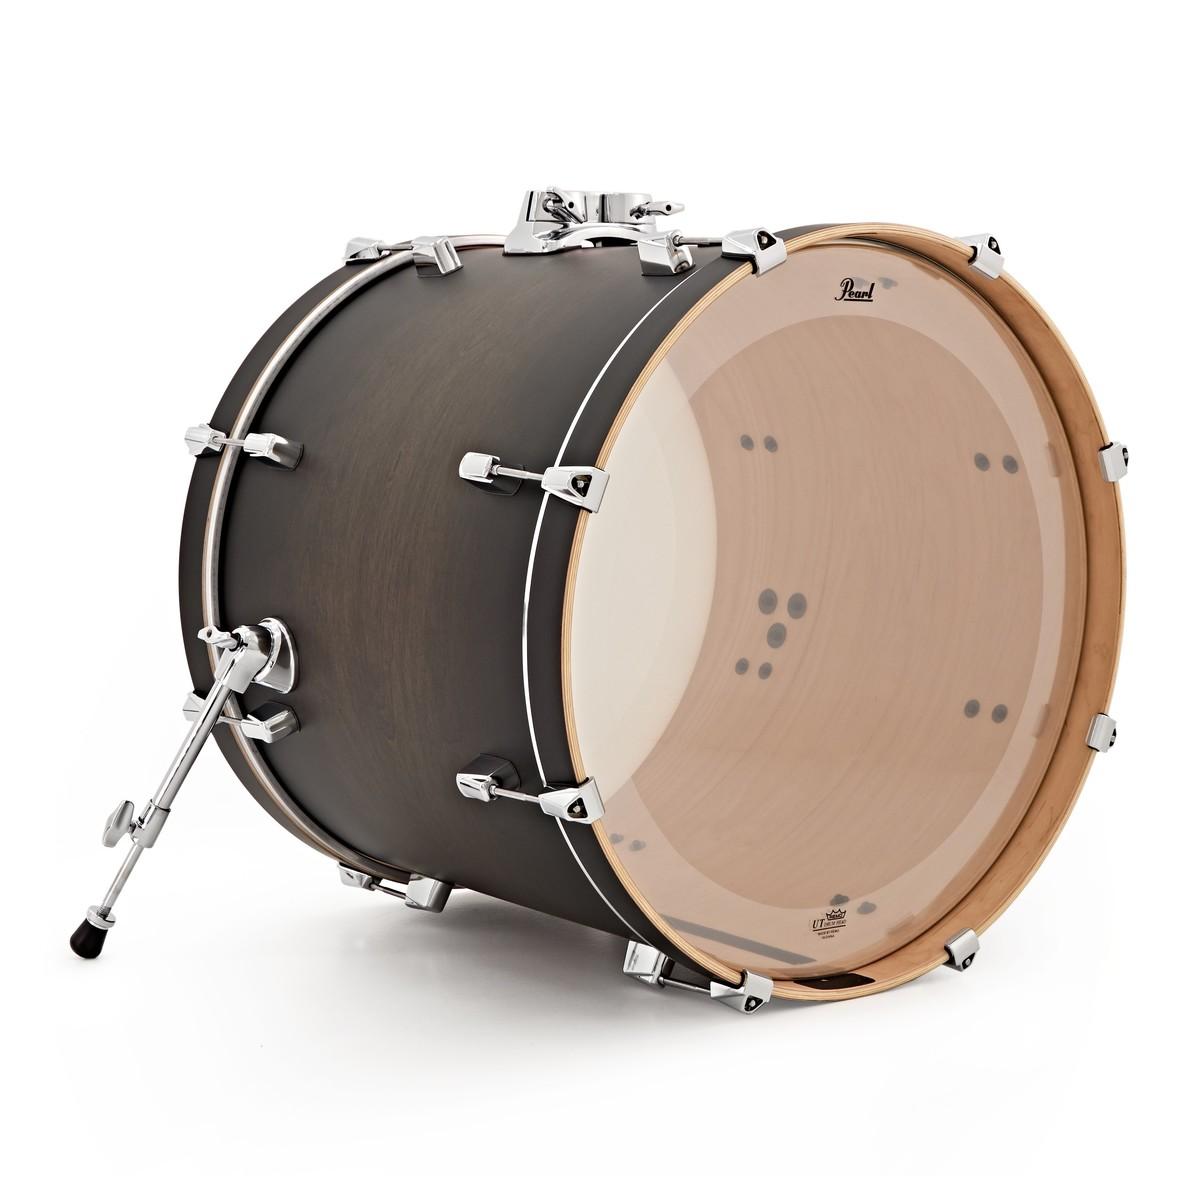 pearl decade maple 22 x 18 39 39 bass drum satin black burst at gear4music. Black Bedroom Furniture Sets. Home Design Ideas